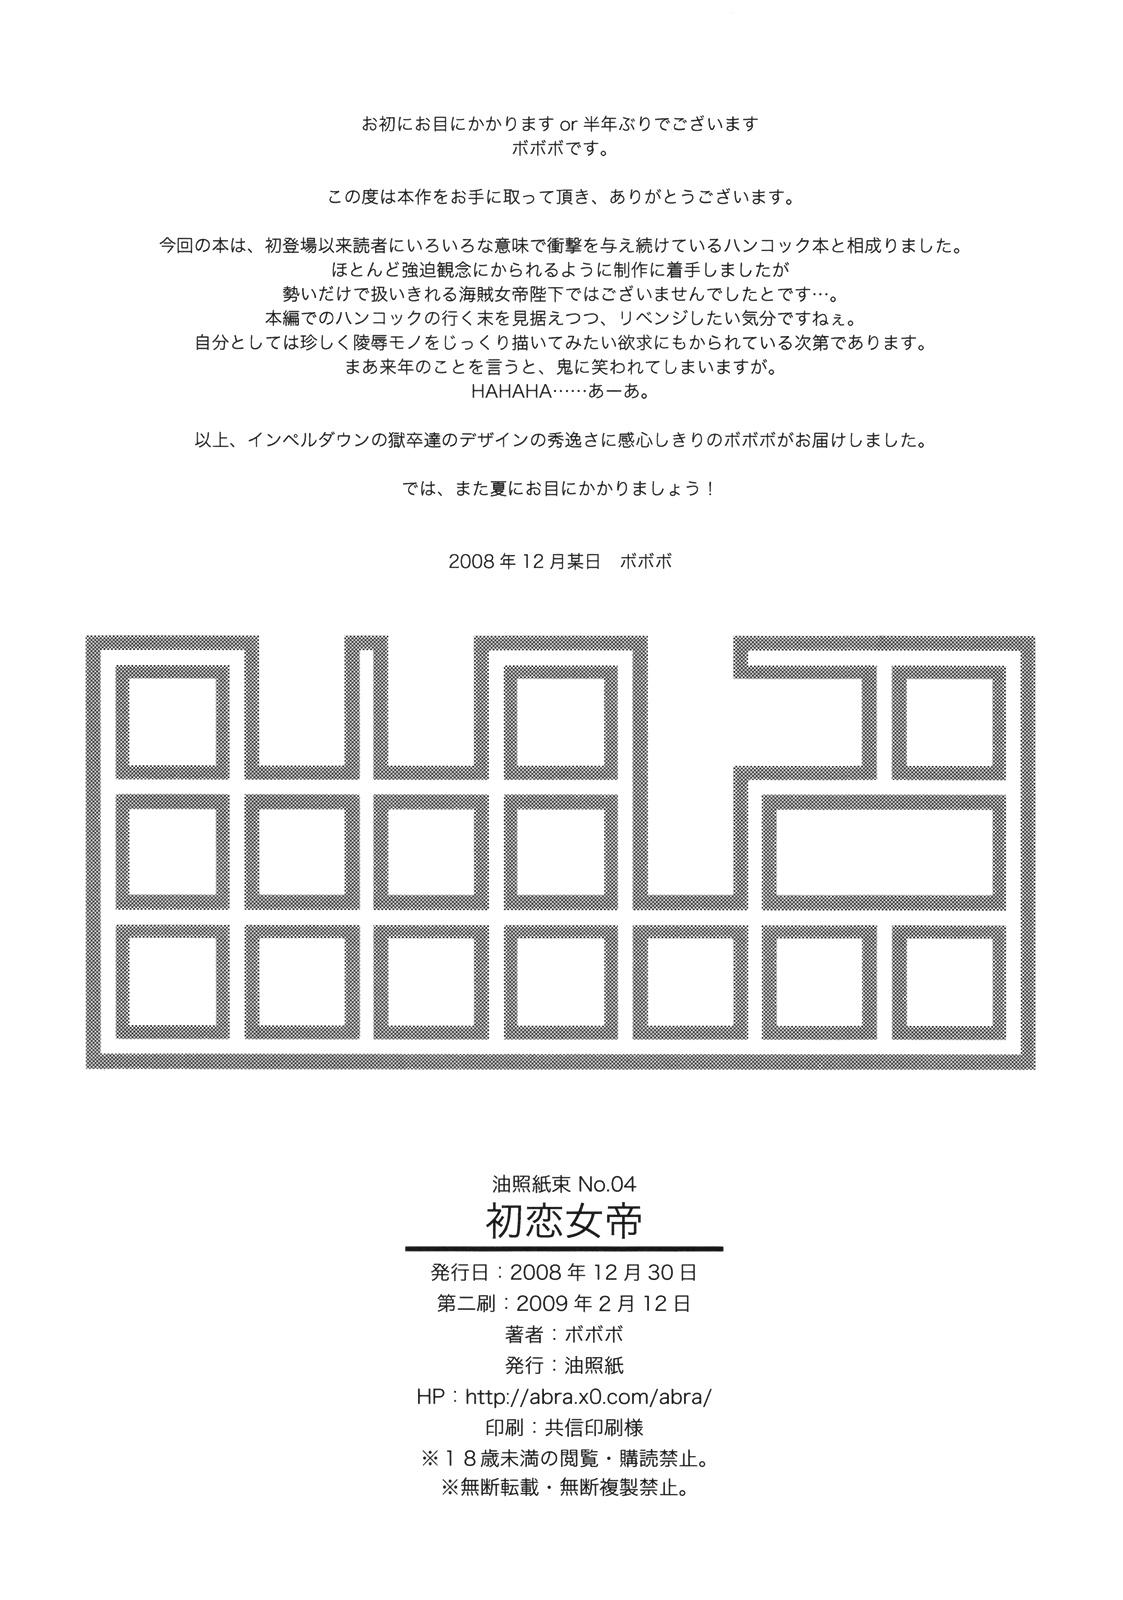 Abradeli Kamitaba No.04 Hatsukoi Jotei 26